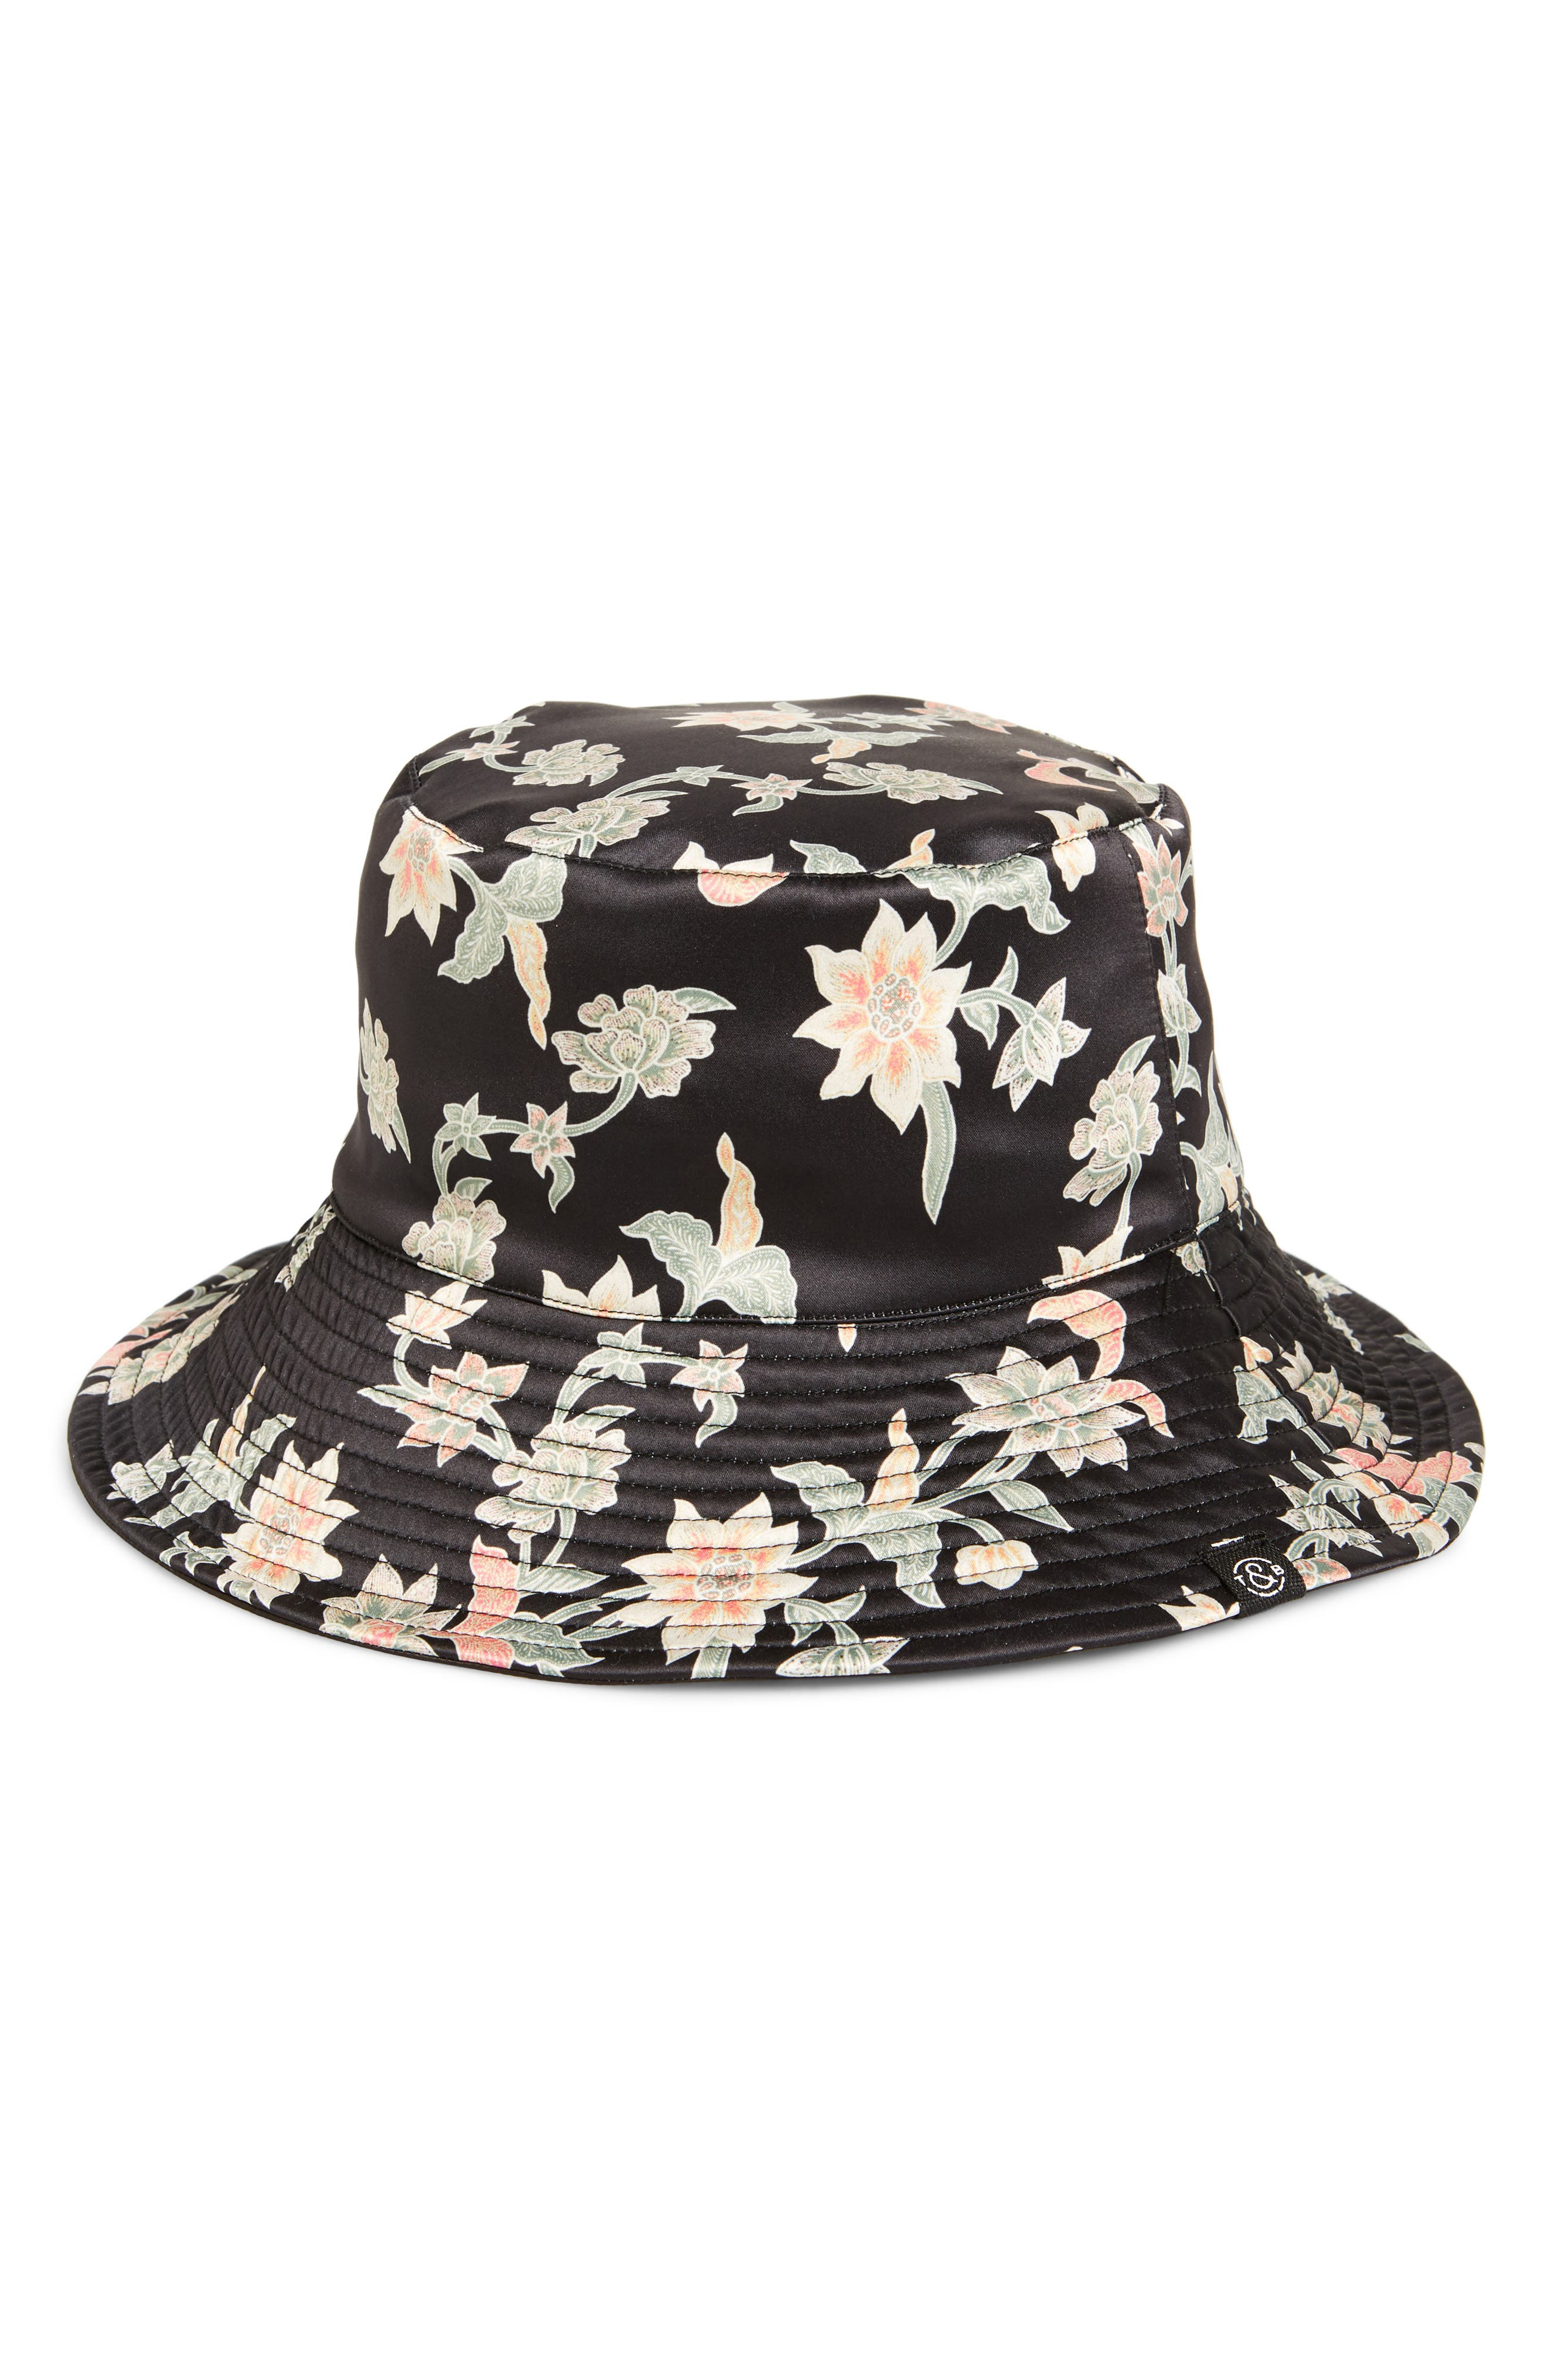 4b99eaaac5282 Treasure   Bond Hats for Women